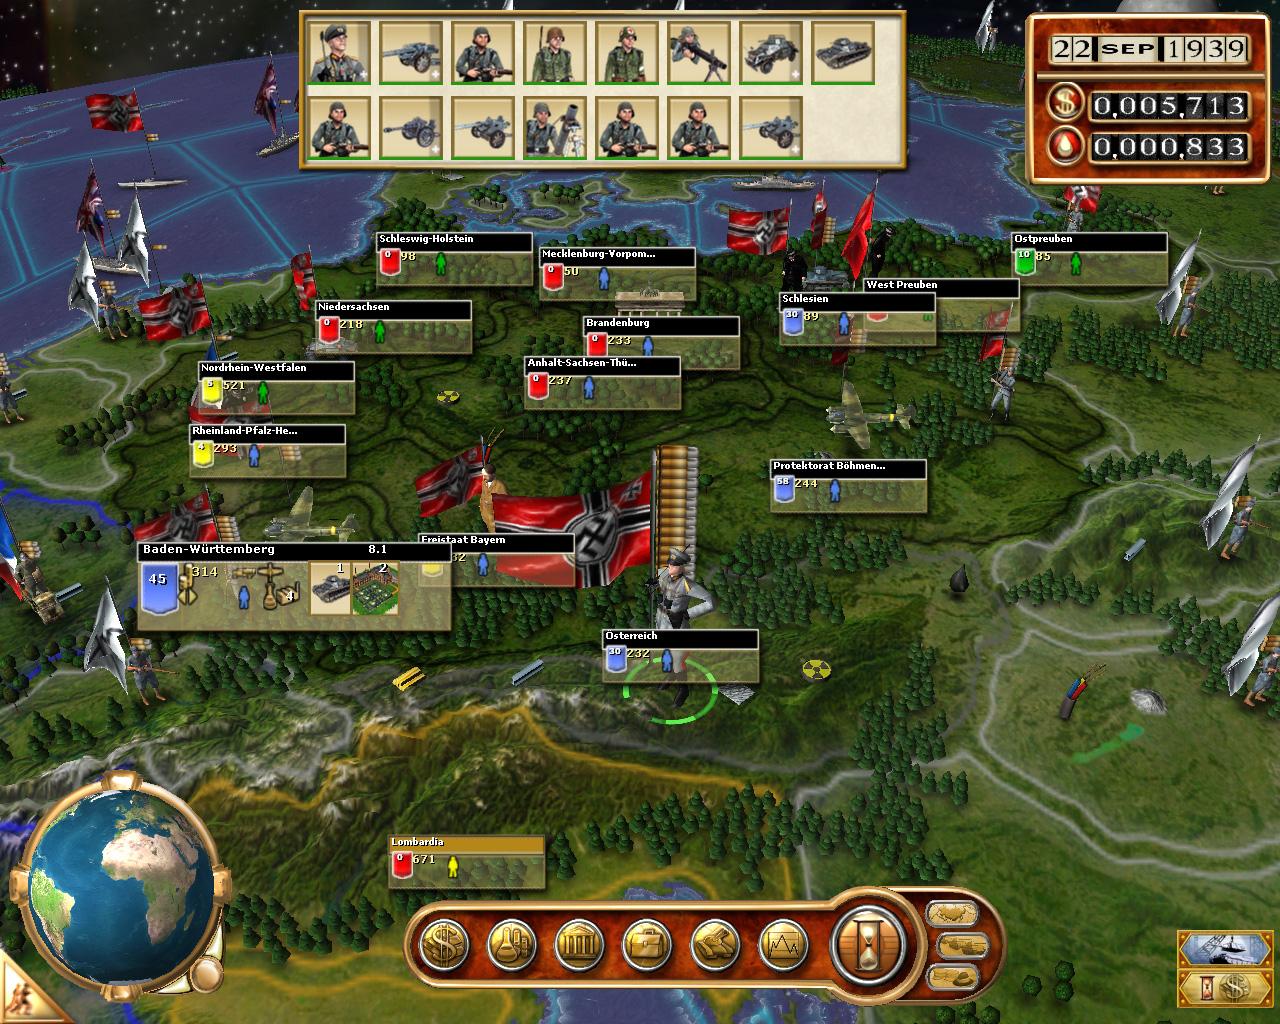 battle leadership Leadership, battle, skills, skills information for uncharted waters online guide.